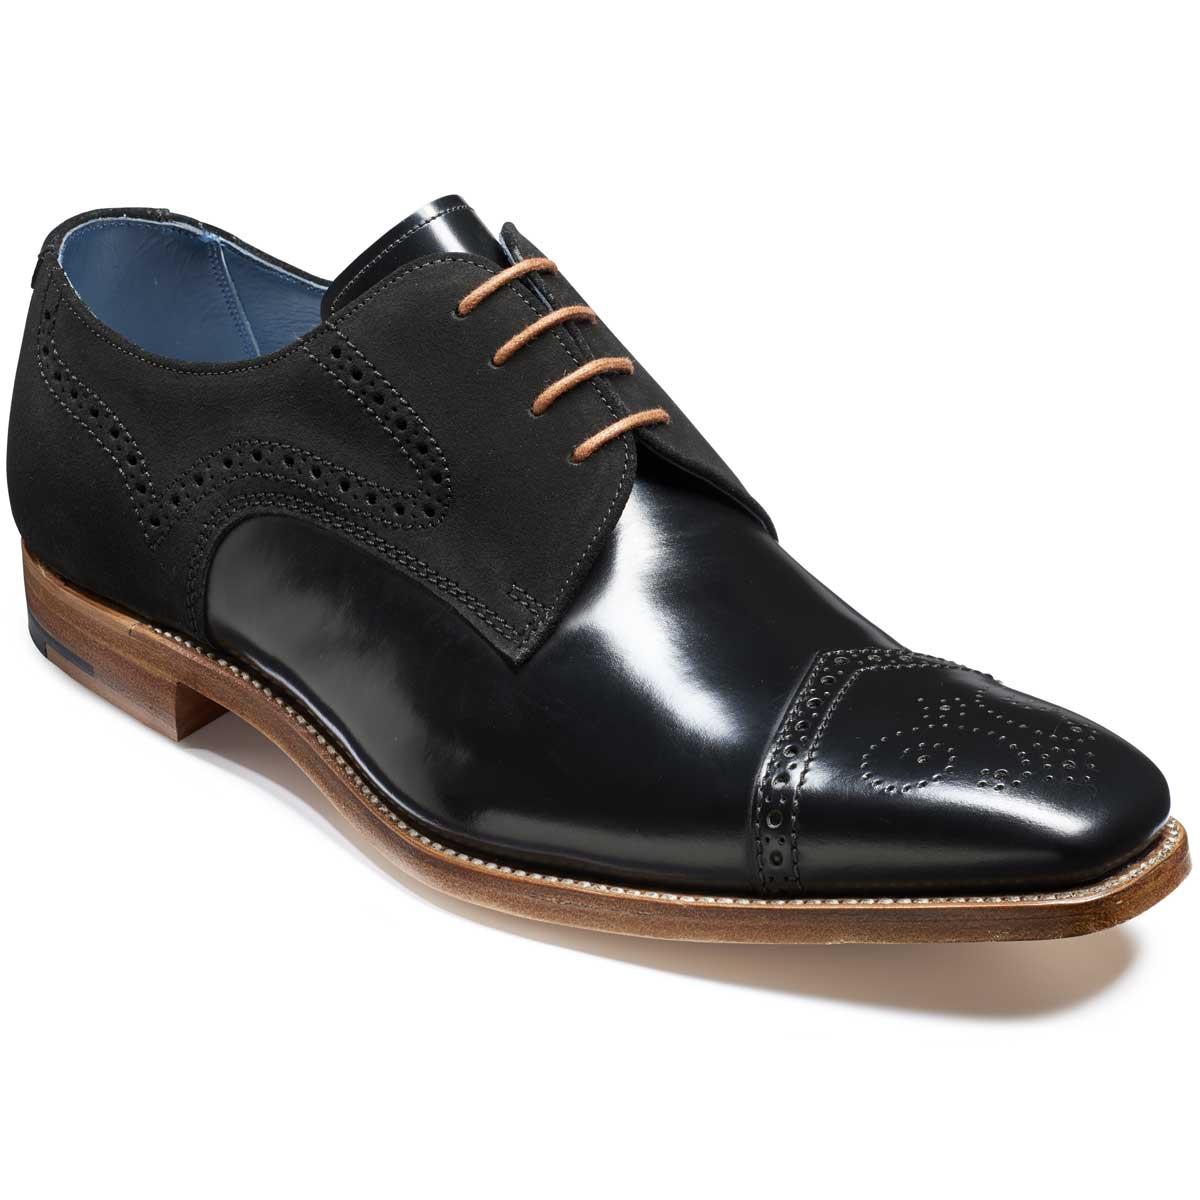 Barker Luca Derby Shoes